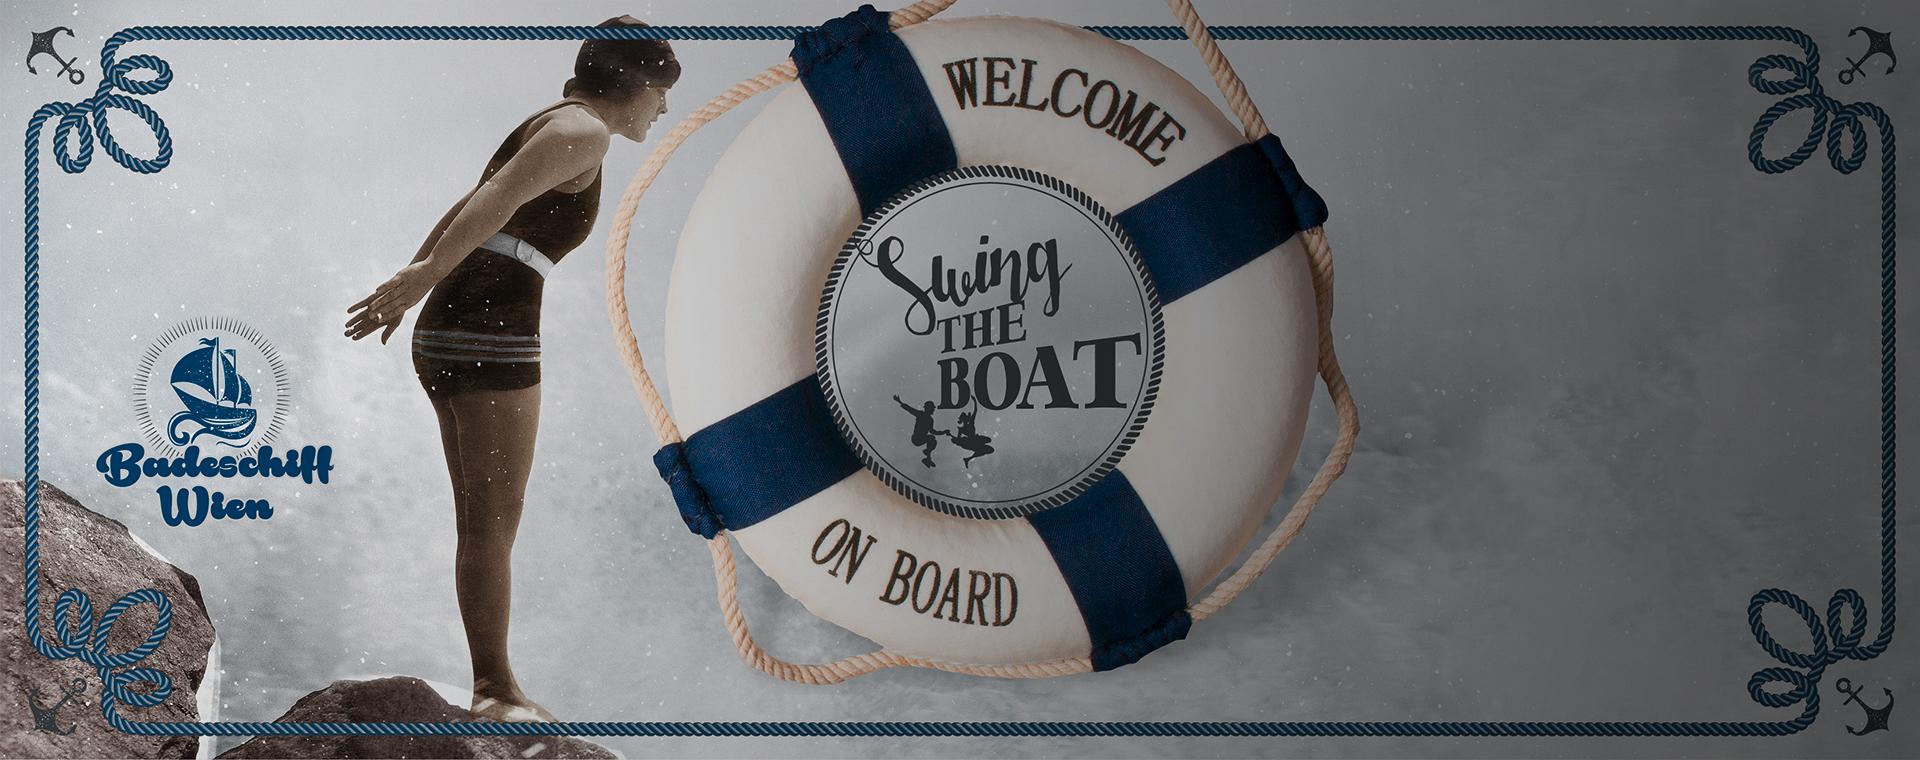 Swing-The-Boat-Every-Sunday-Badeschiff